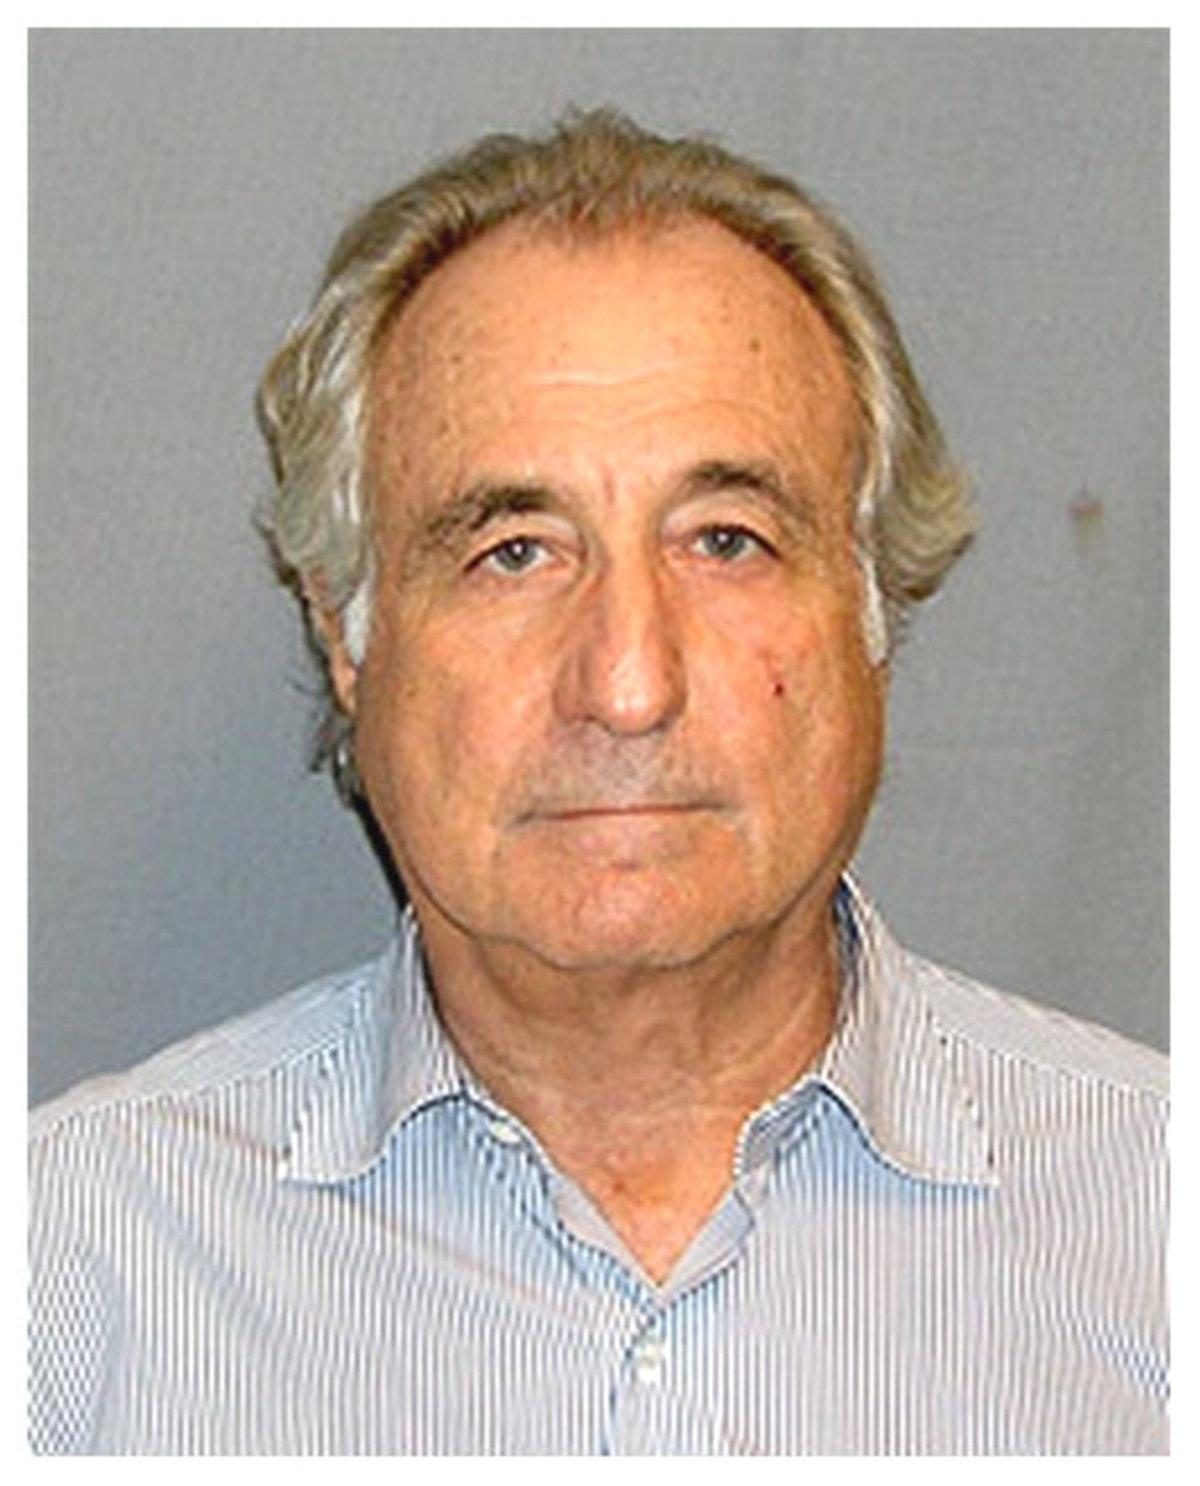 Bernard Madoff mugshot in circa 2008. (Photo courtesy Bureau of Prisons/Getty Images)